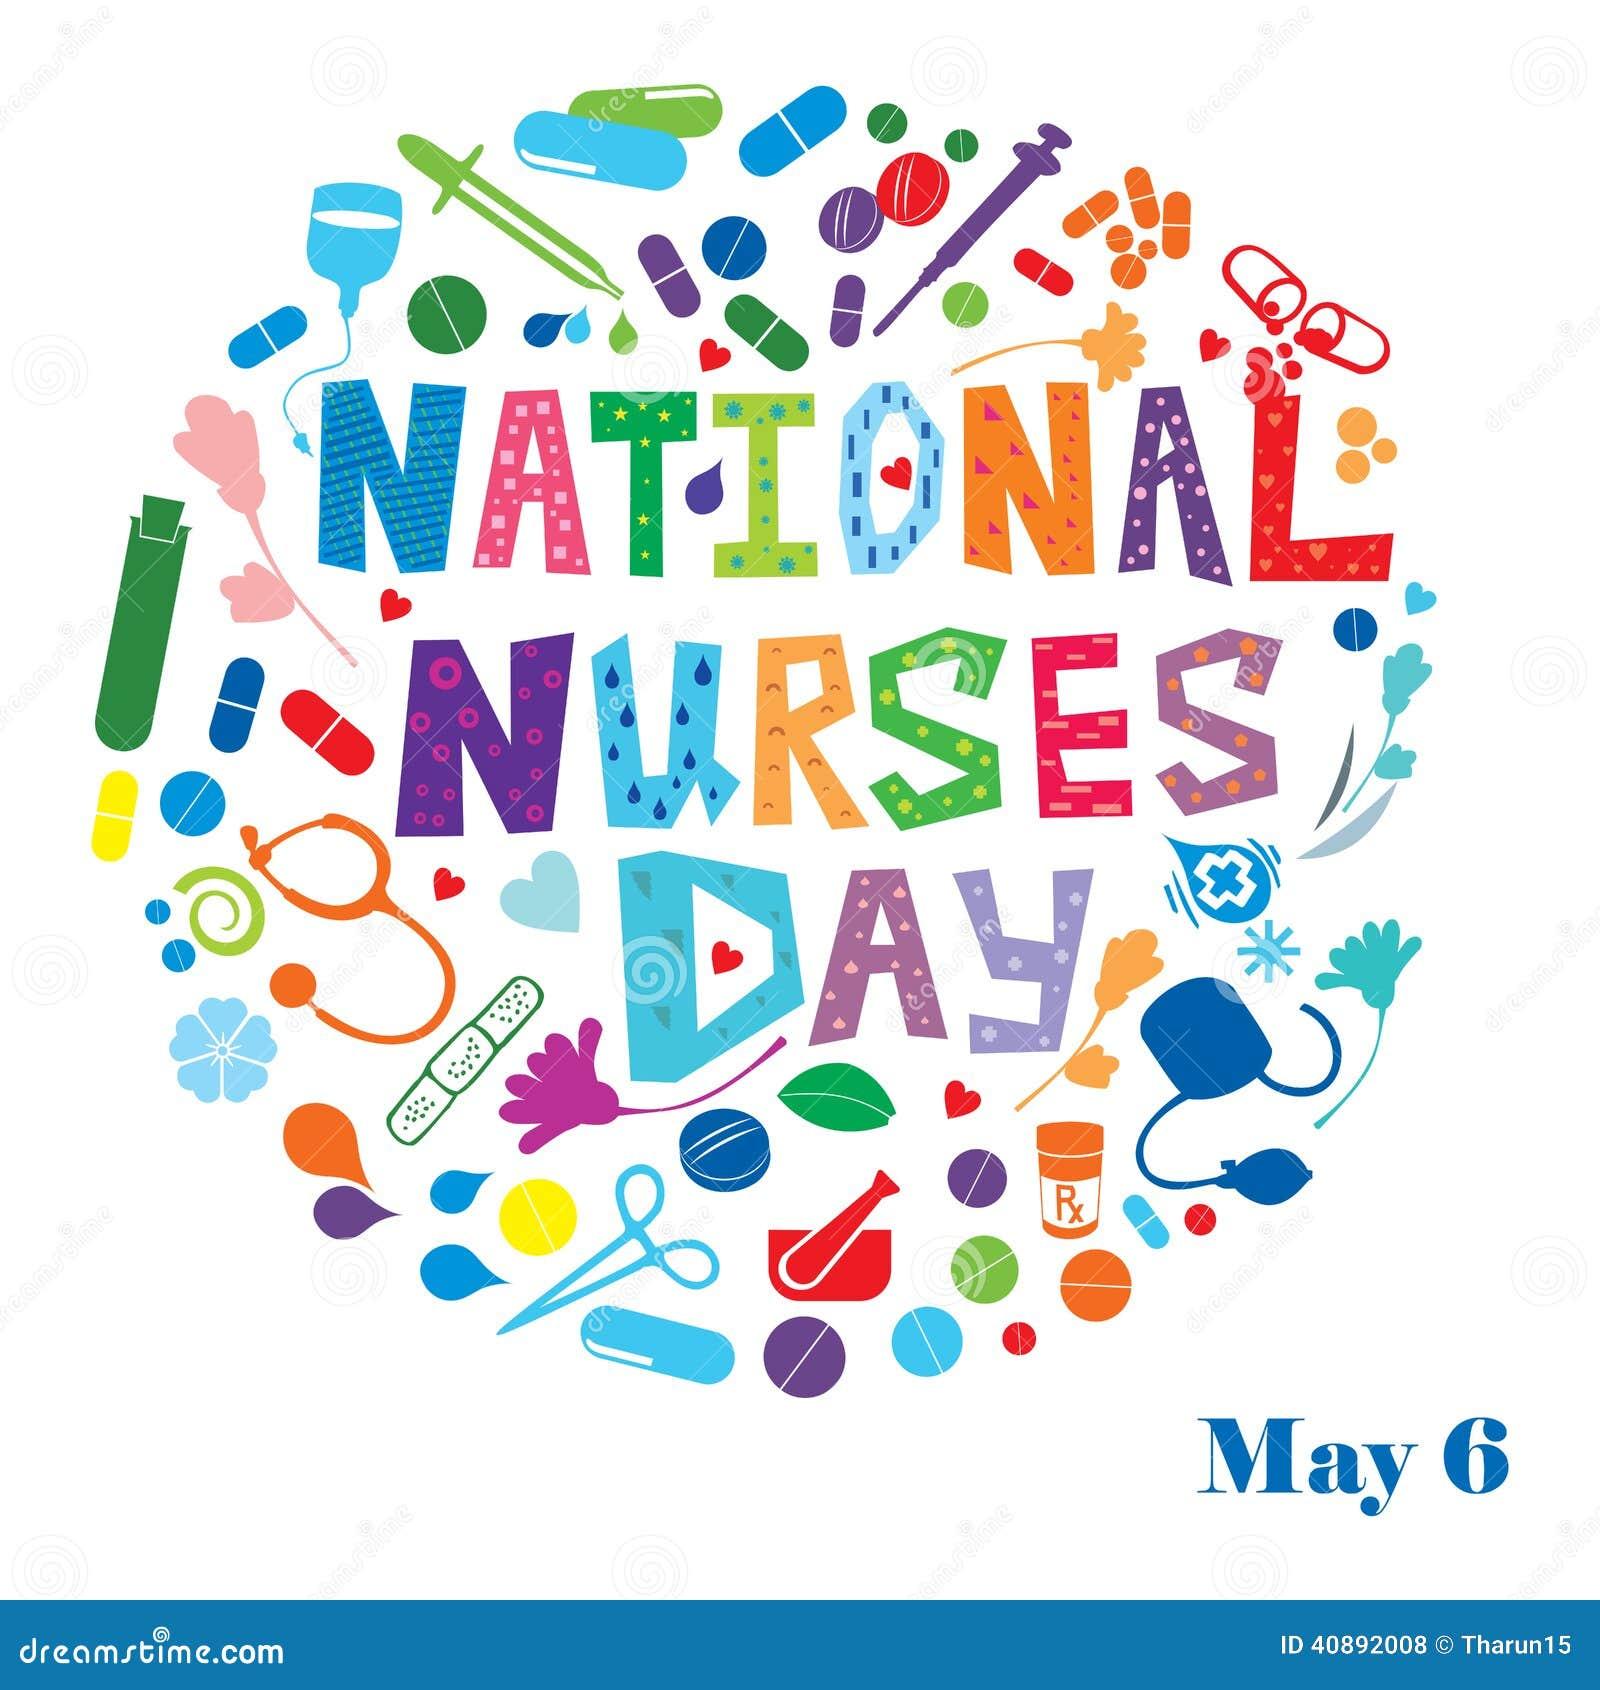 A Cute Wish On Nurses Day. Free Nurses Day eCards, Greeting Cards ...